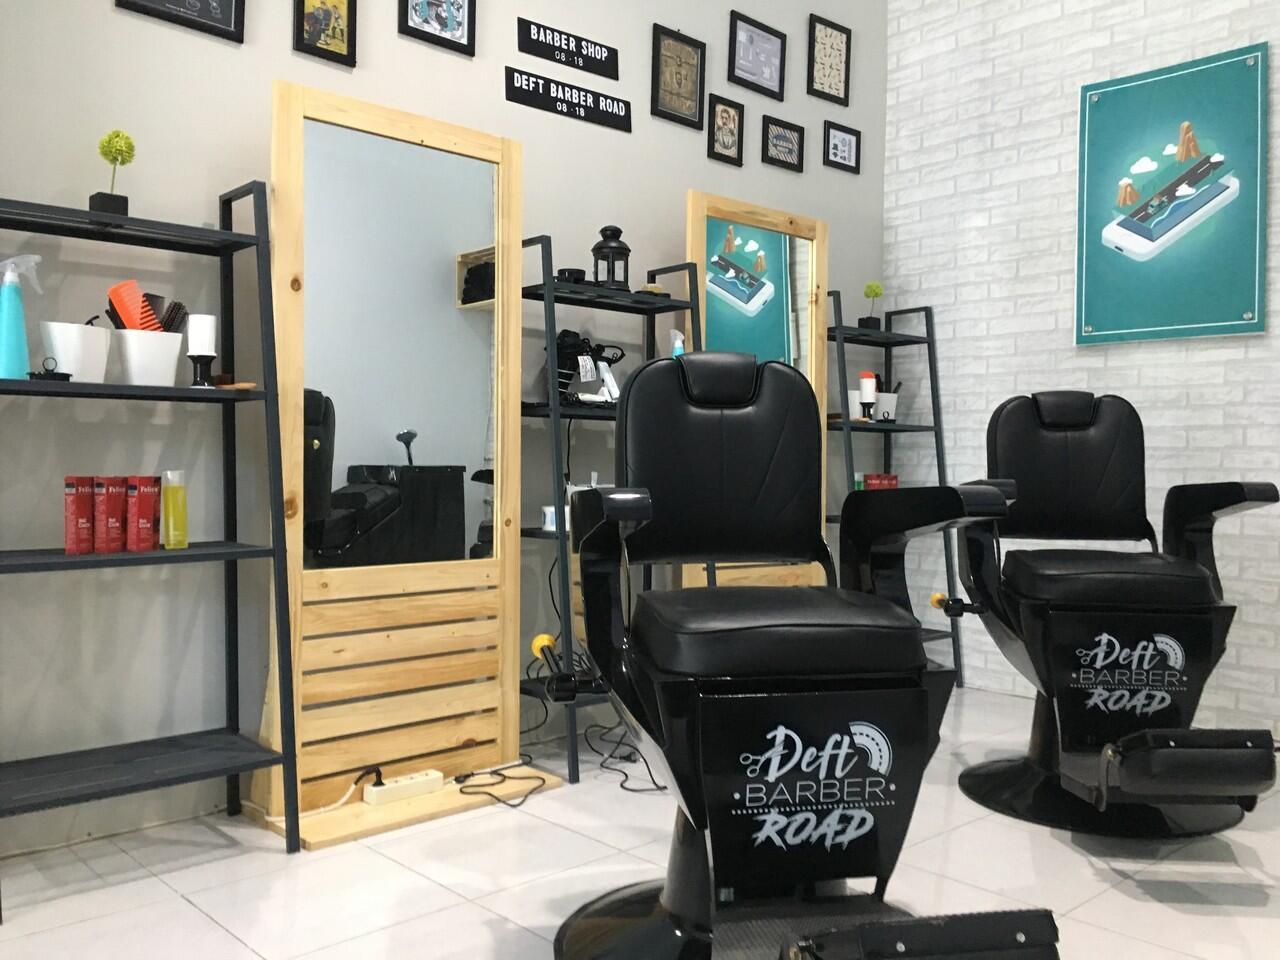 Lowongan kerja barberman / tukang cukur / kapster jakarta, bekasi, sumatera selatan